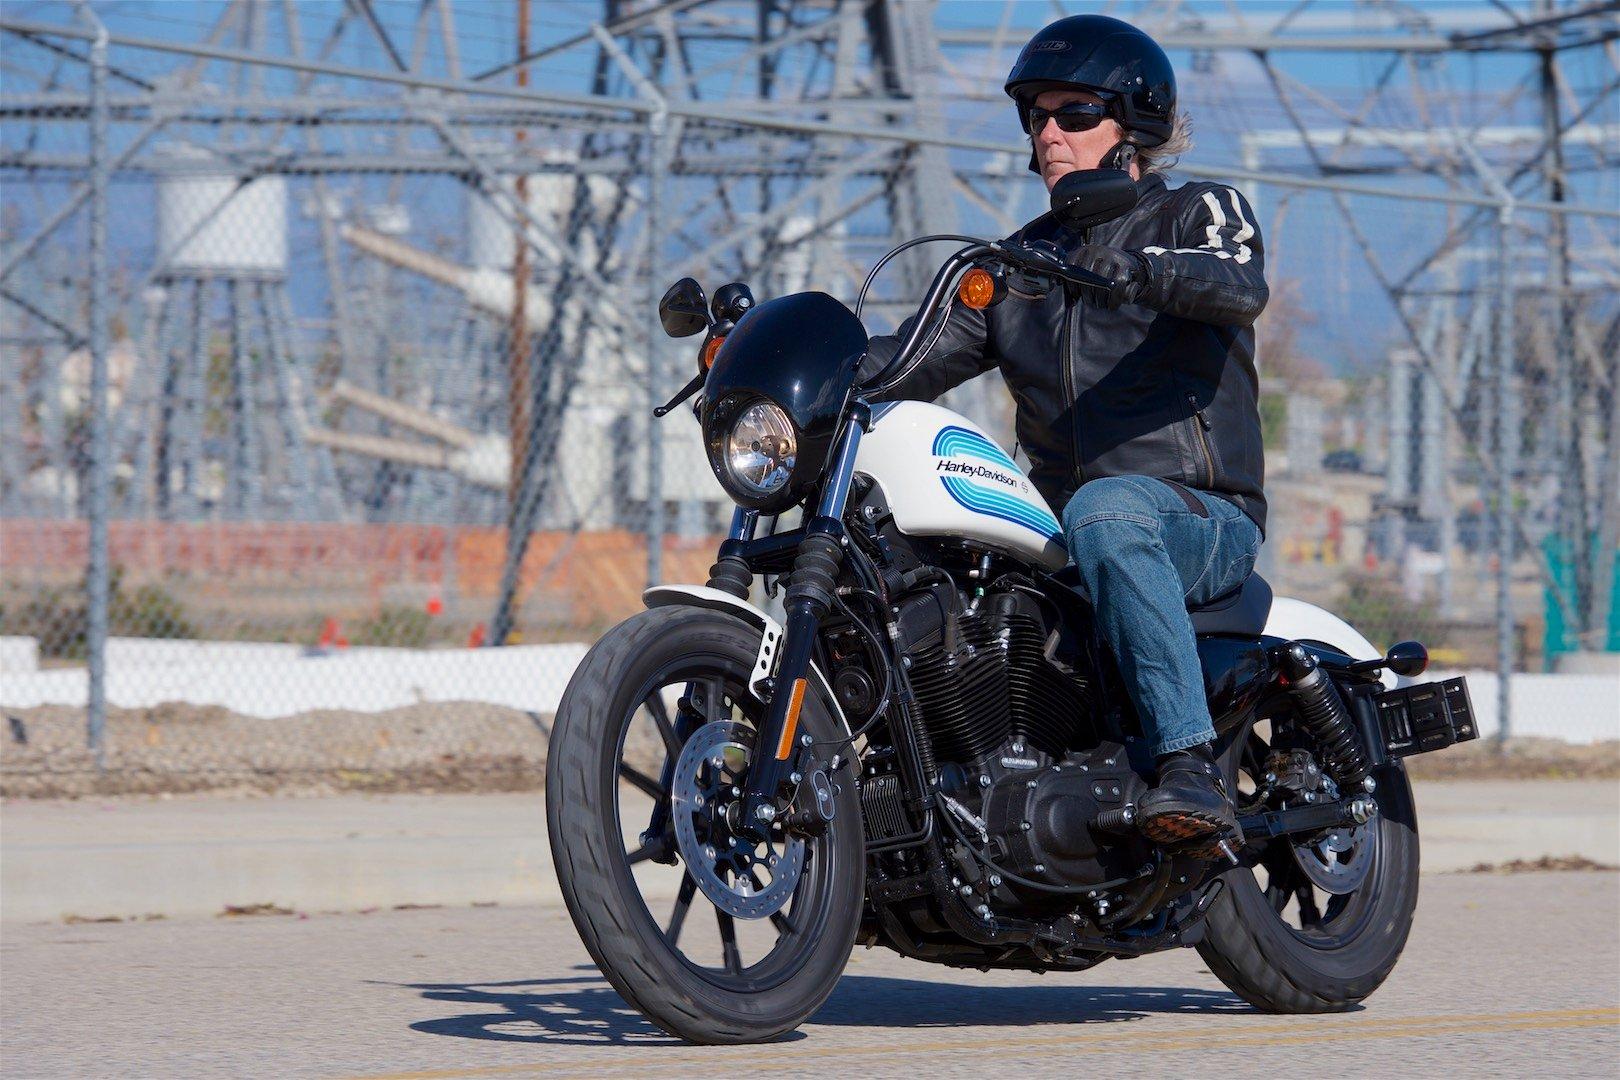 2018 Harley-Davidson Iron 1200 review